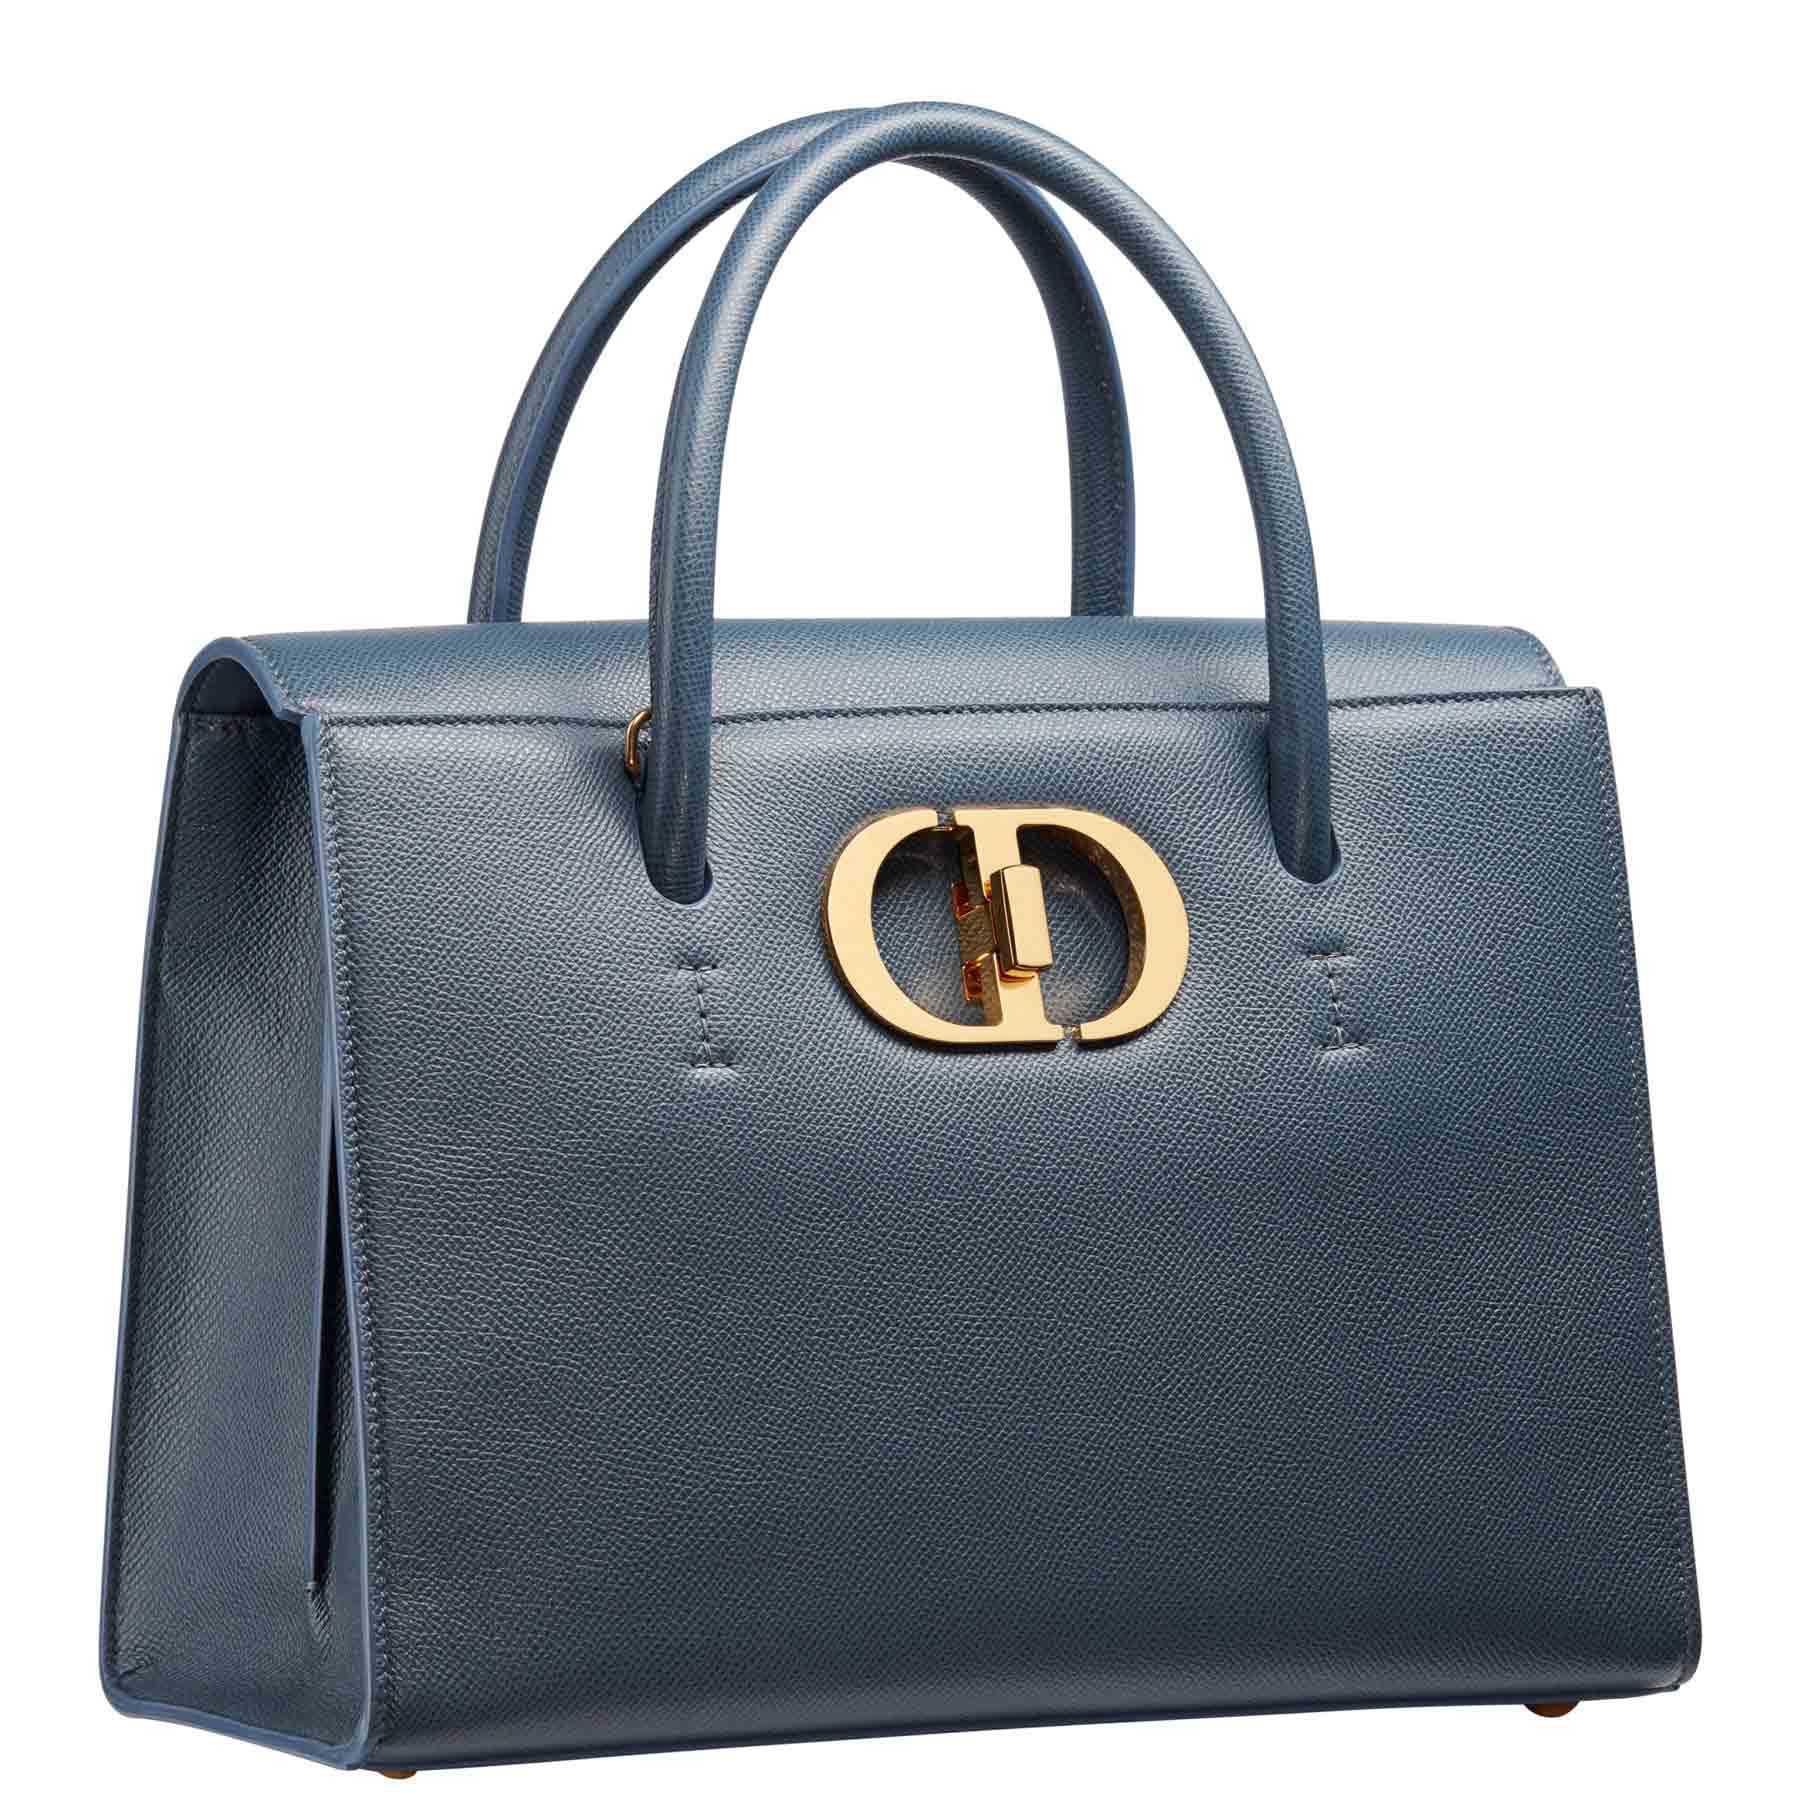 Tas berwarna biru dengan bahan kulit grained